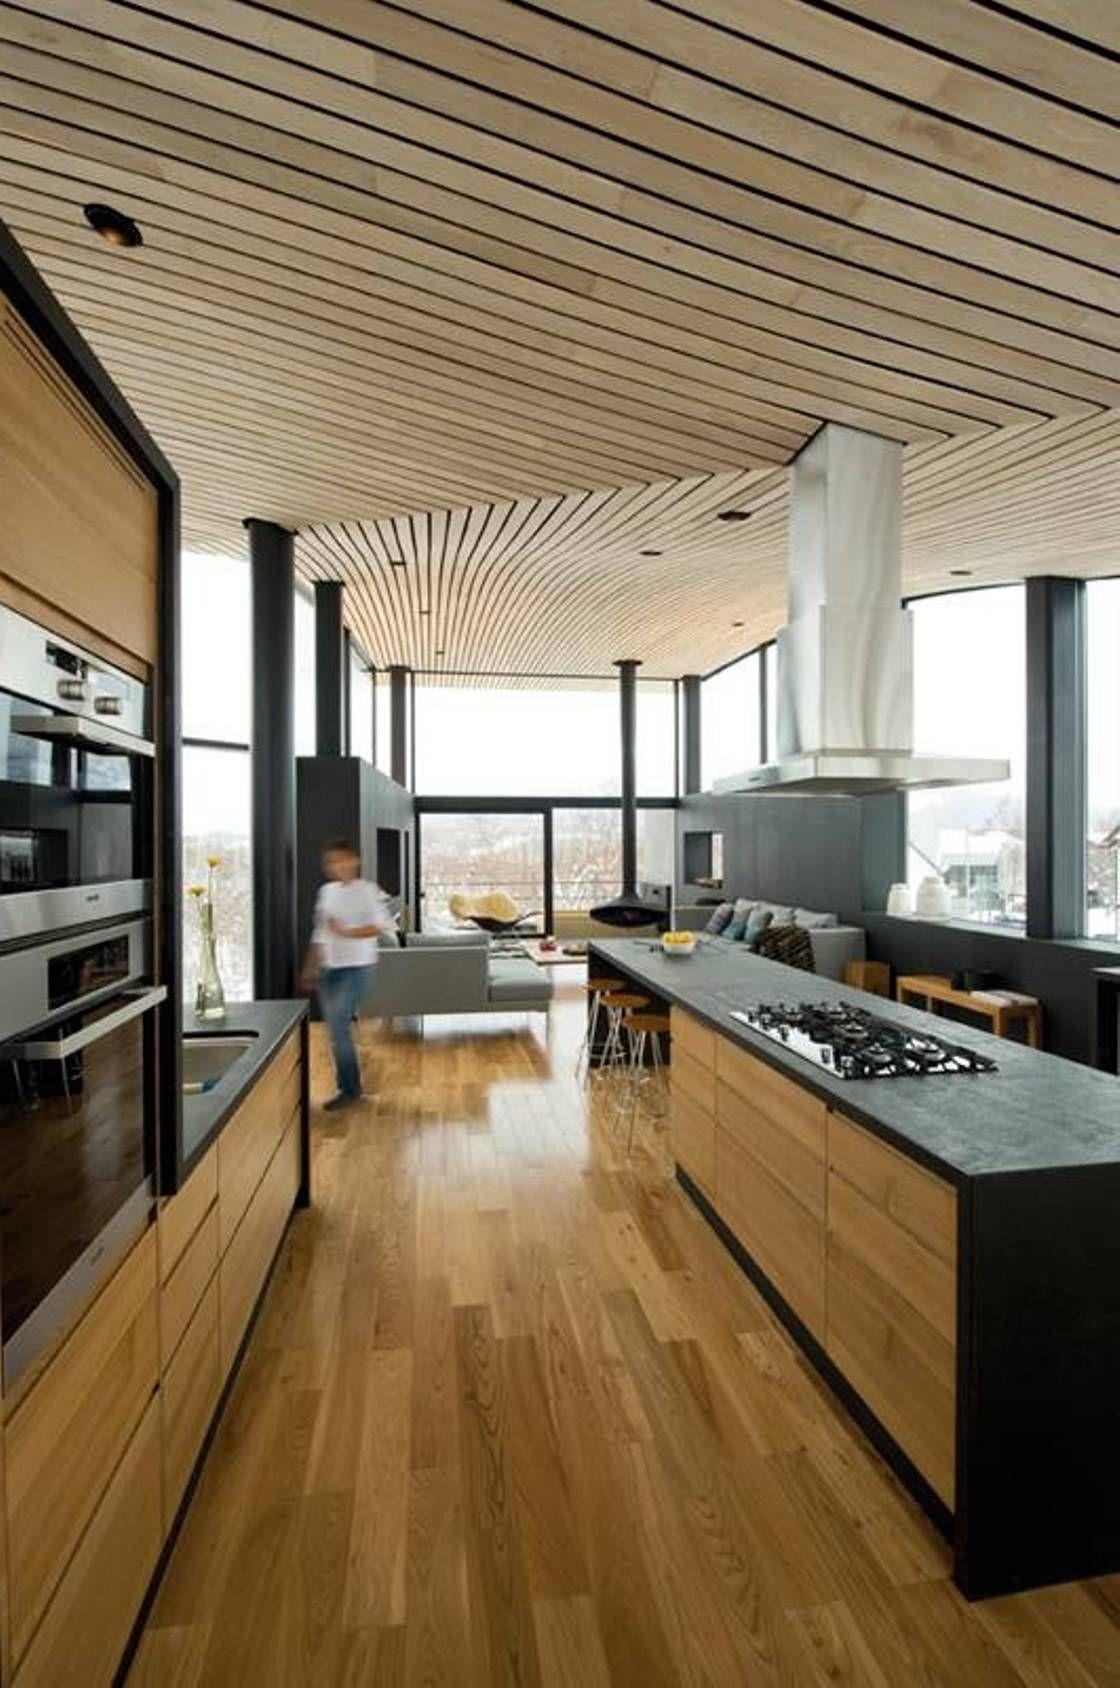 Awesome Modern Japanese Style Kitchen Idea Kitchen Inspiration Design Kitchen Styling Kitchen Cabinets Design Layout